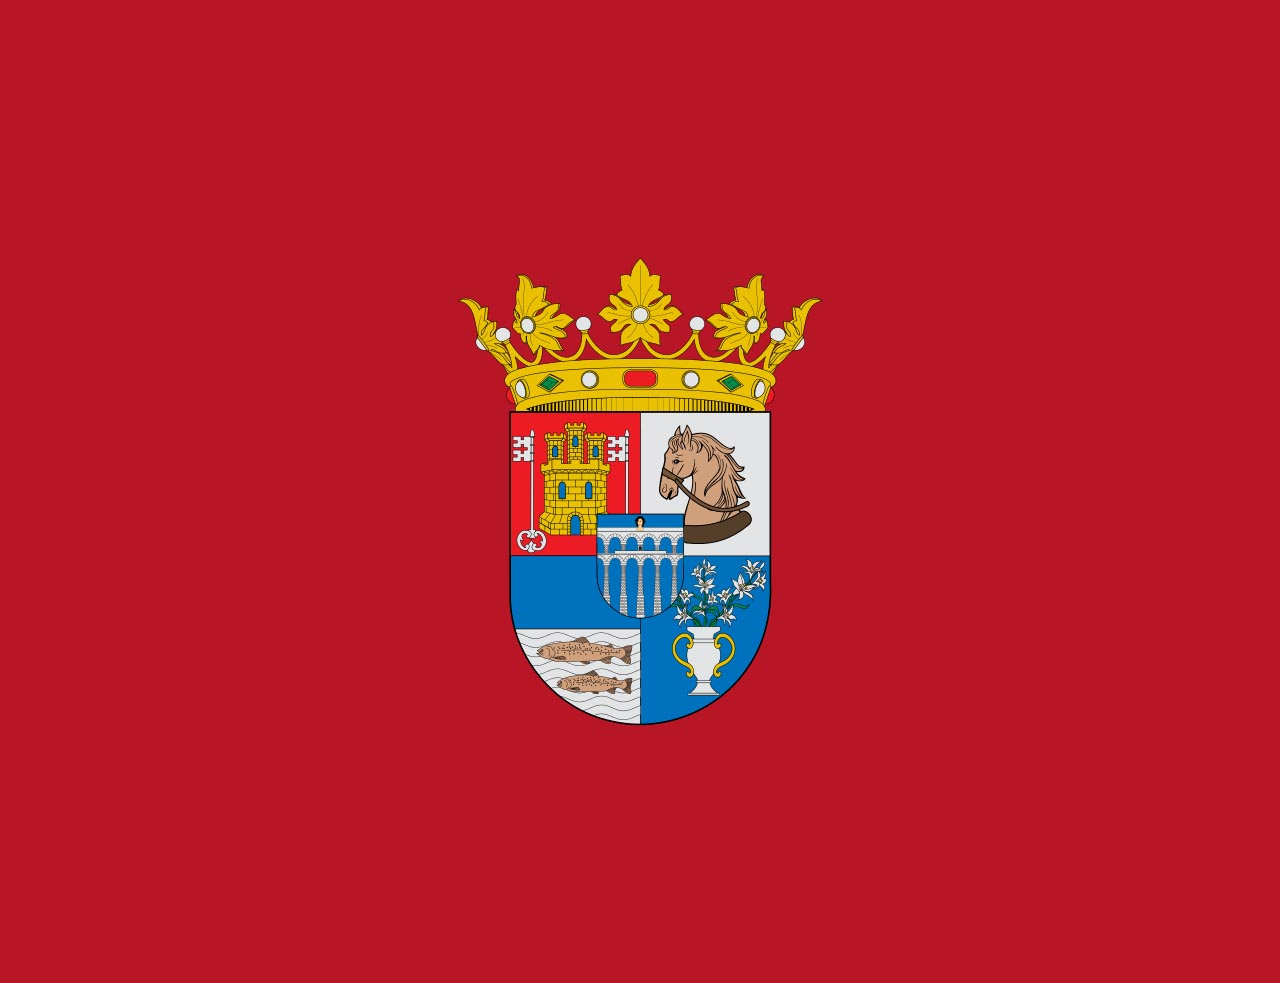 Флаг провинции Сеговия (Segovia)